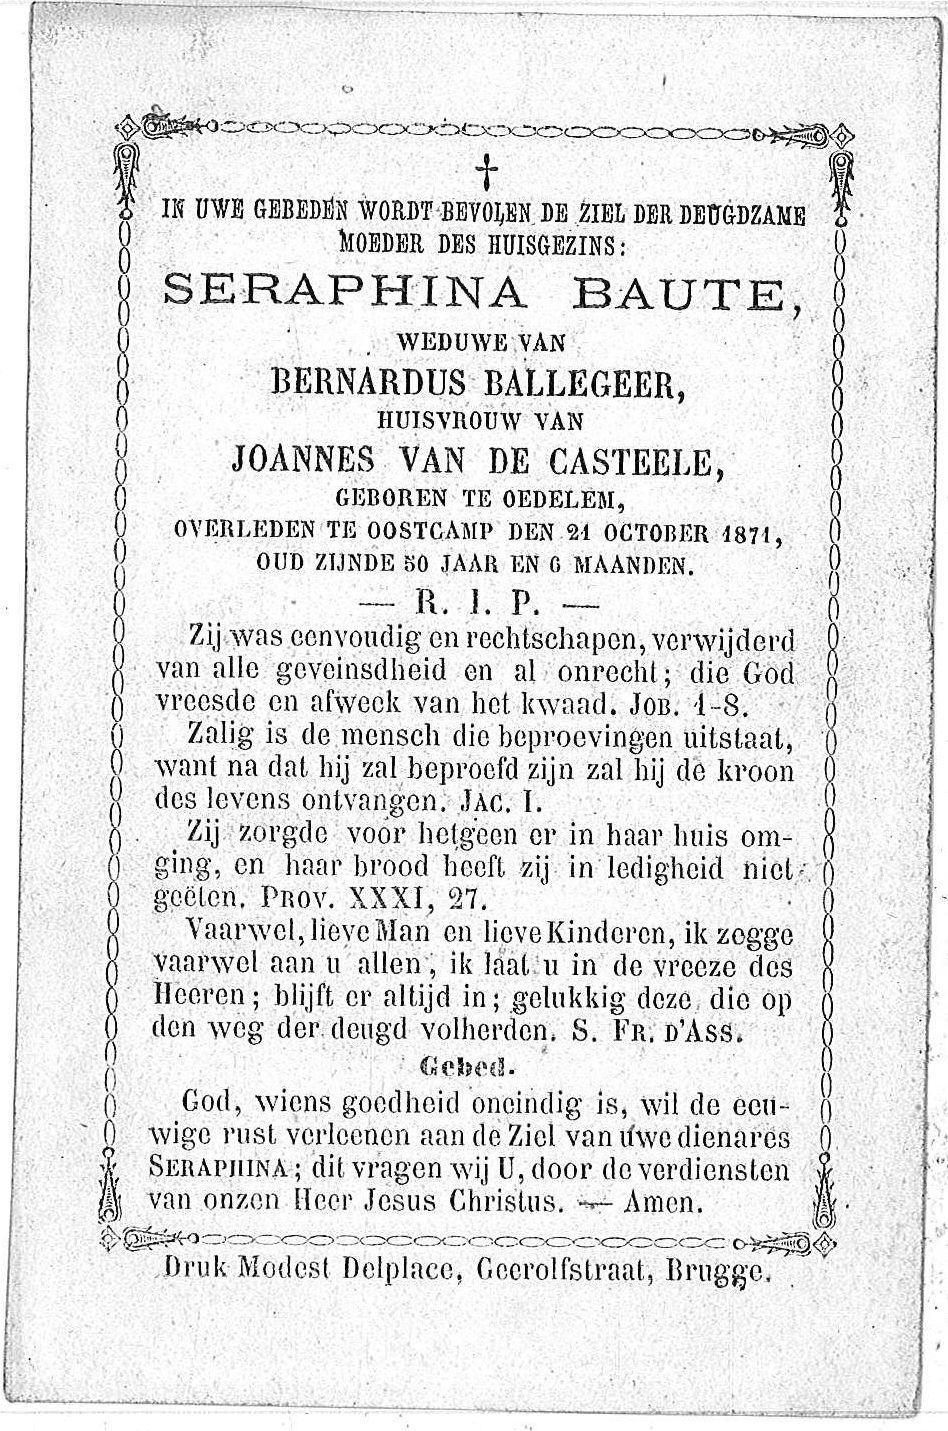 Seraphina Baute